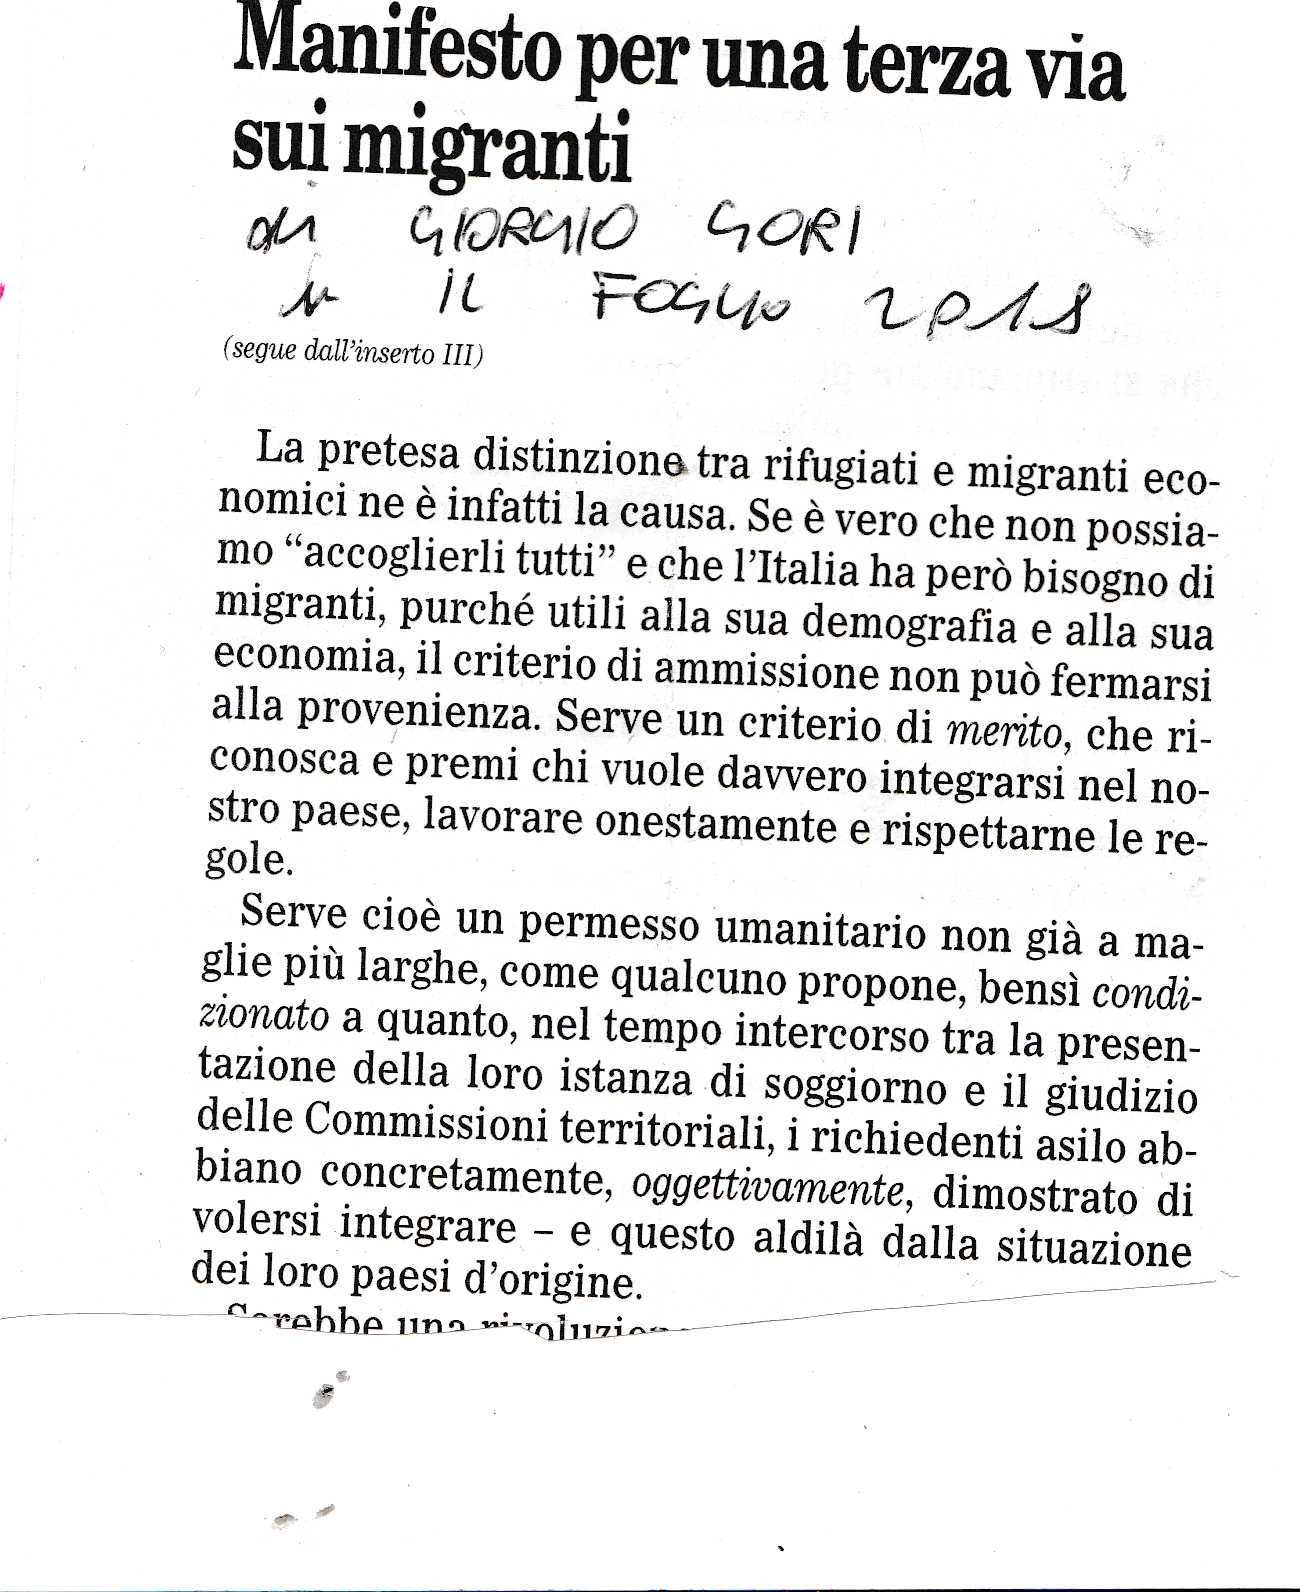 gori migranti3491